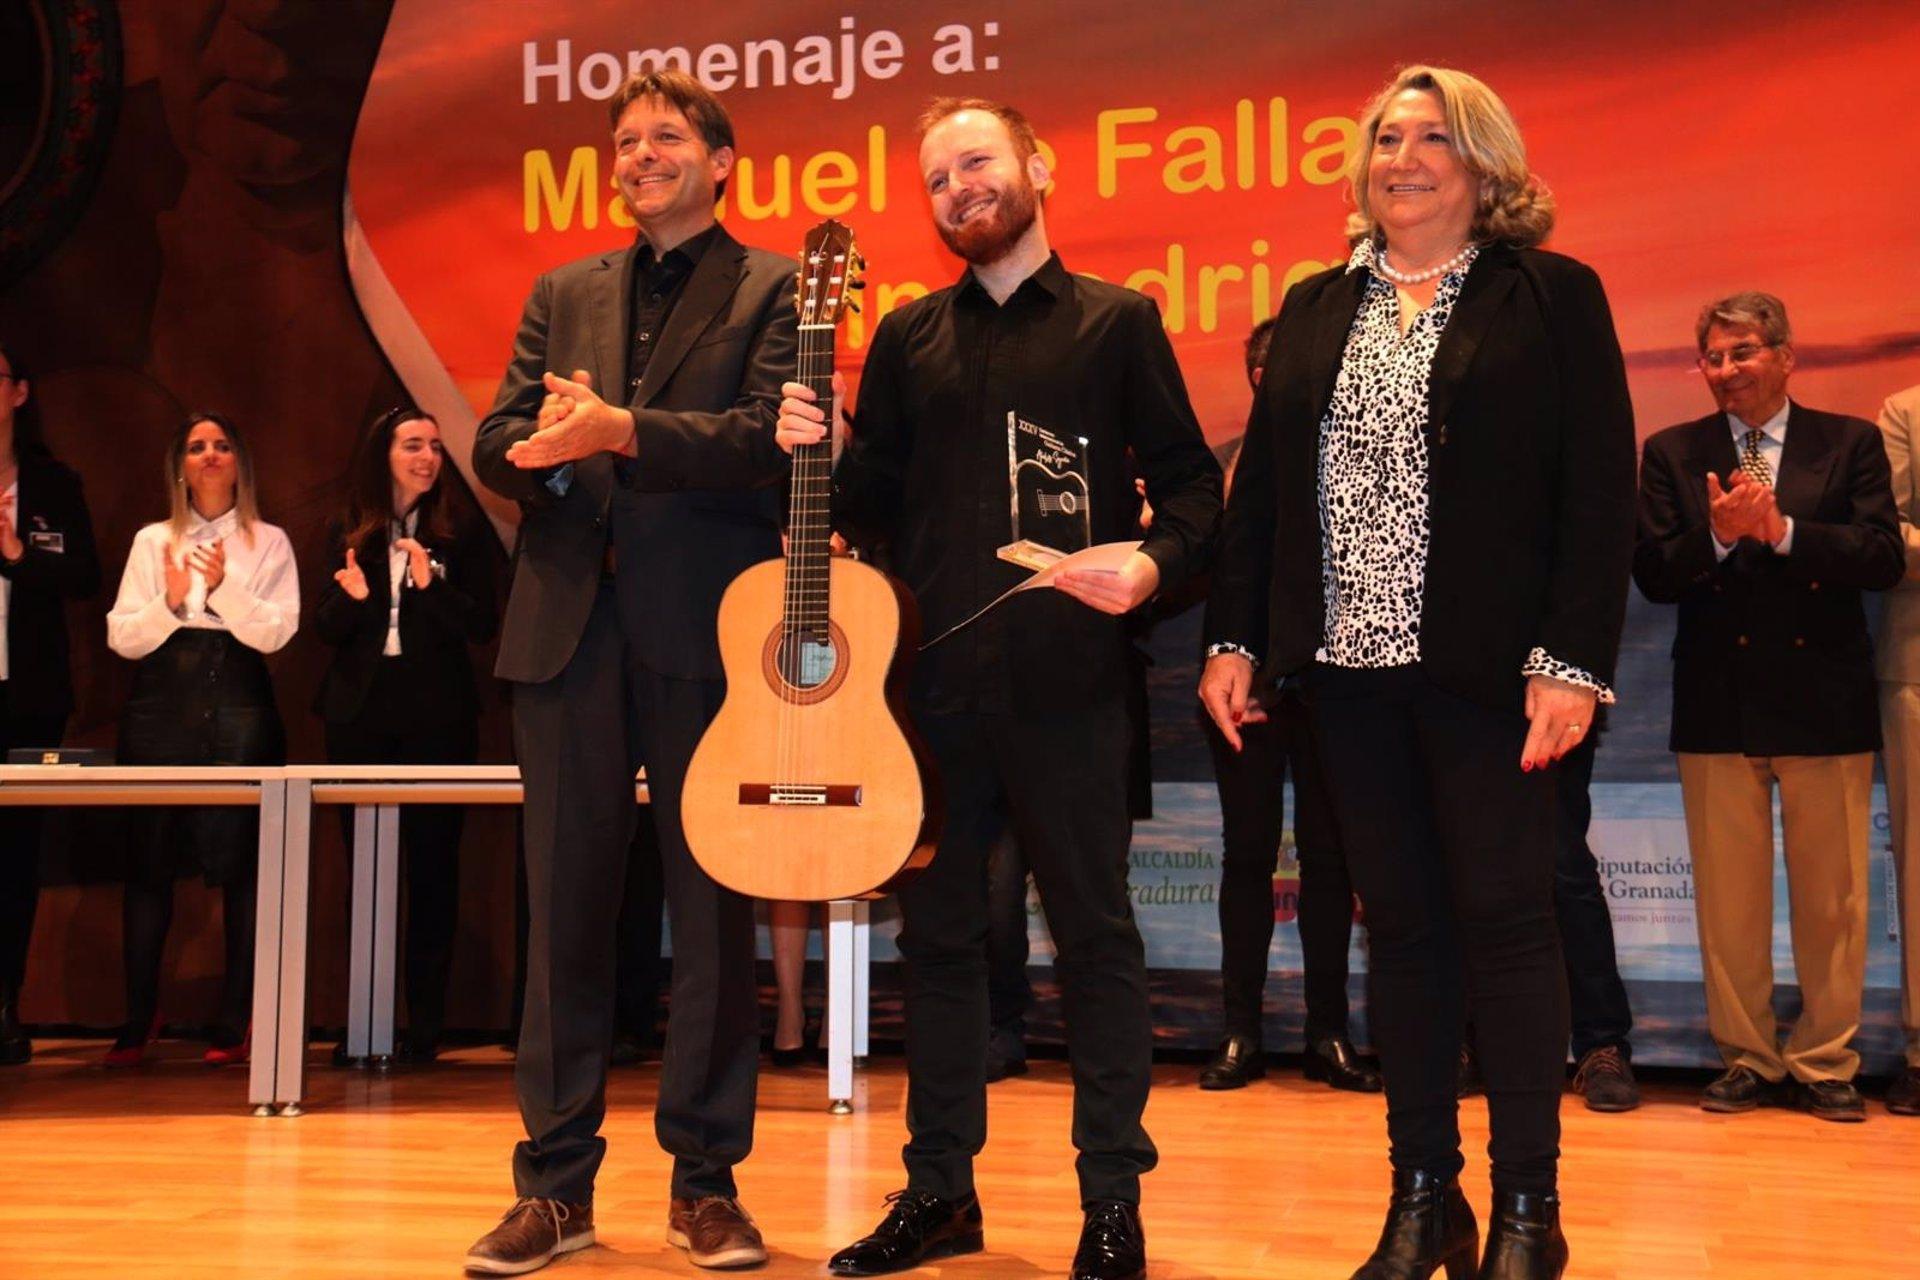 Aplazado el XXXVI Certamen Internacional de Guitarra Clásica Andrés Segovia hasta mayo